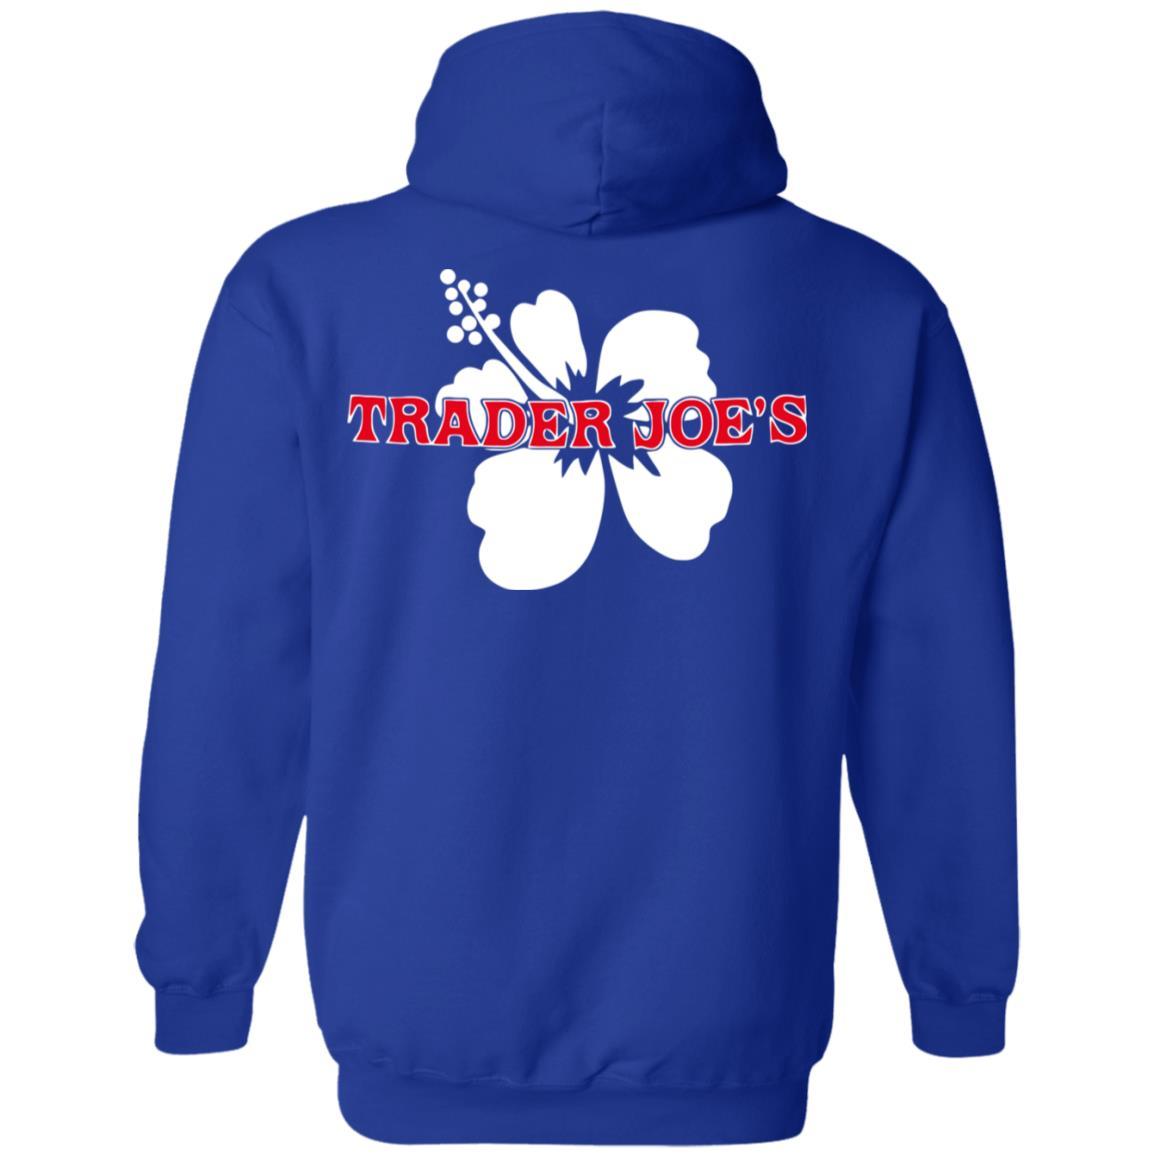 Trader Joes Pullover T Shirt Trader Joes Pullover Hoodie Sweatshirt